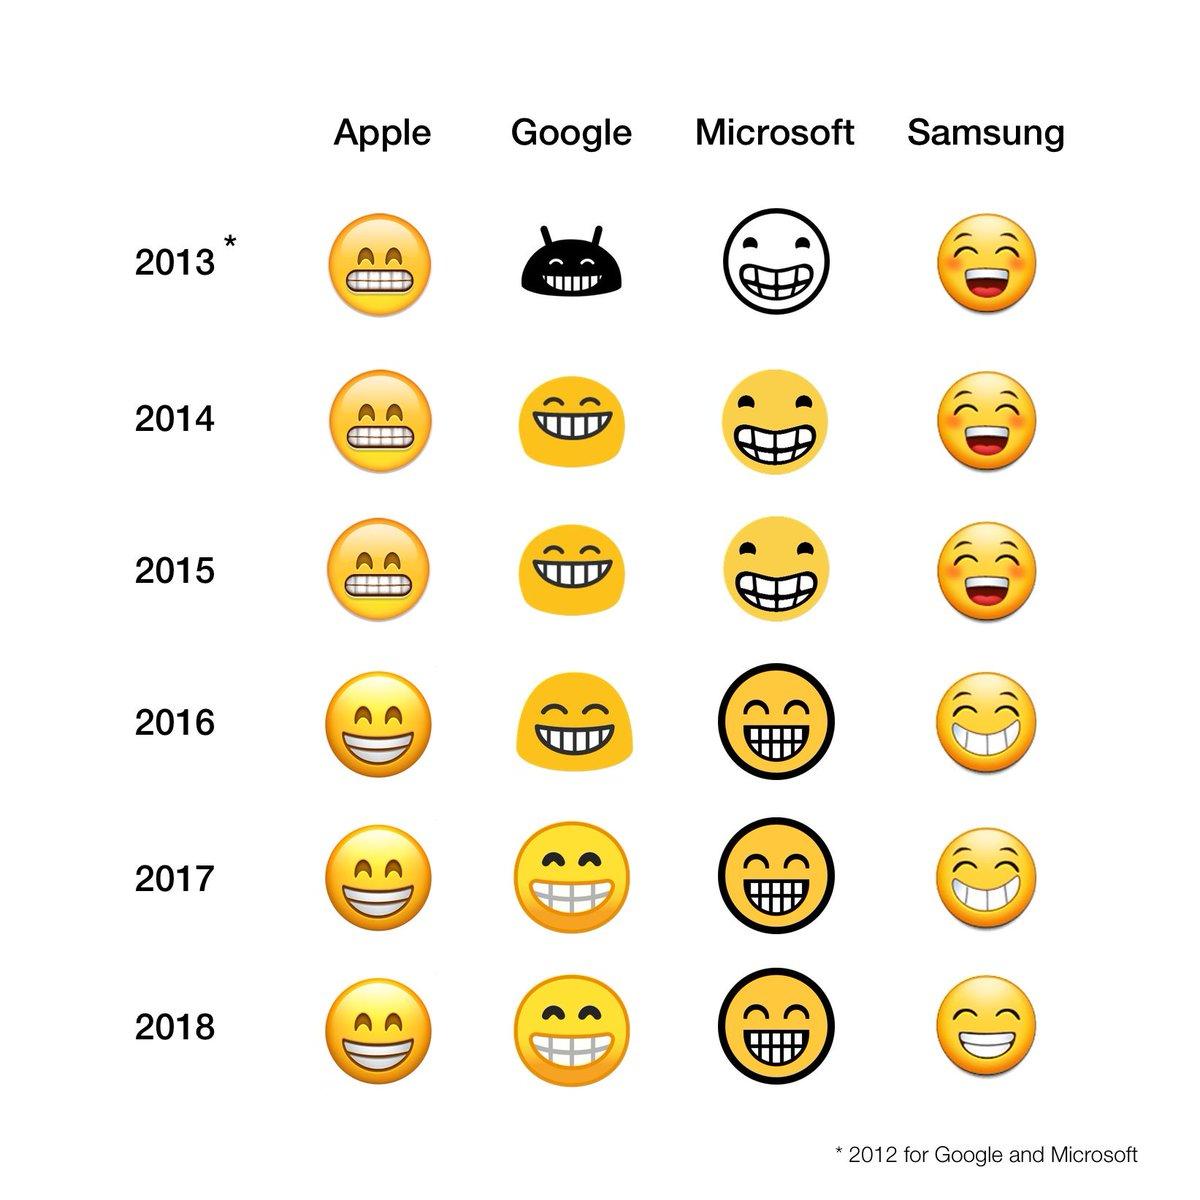 Emojipedia on twitter each year emojis get more similar emojipedia on twitter each year emojis get more similar httpst937x5uyr8w biocorpaavc Image collections